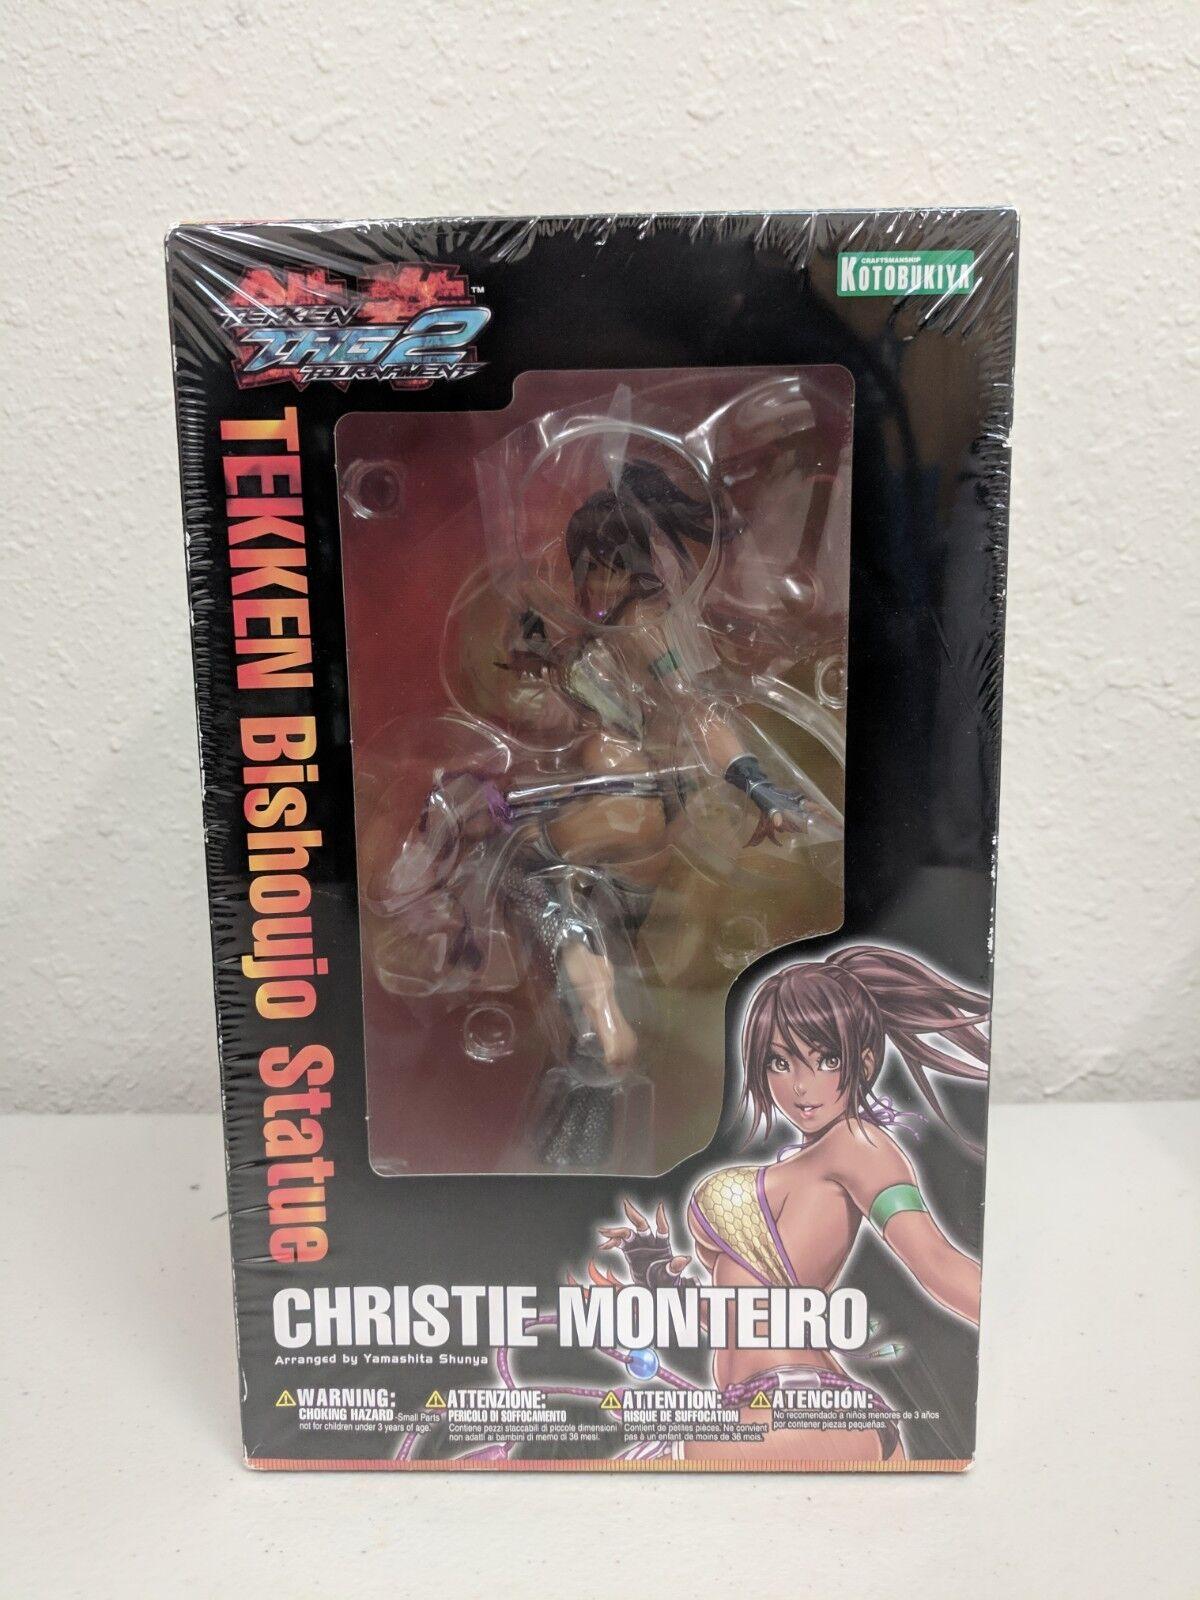 Kotobukiya  Tekken Tag TournaHommest 2  Chriscravate Monteiro Bishoujo Statue  meilleure mode